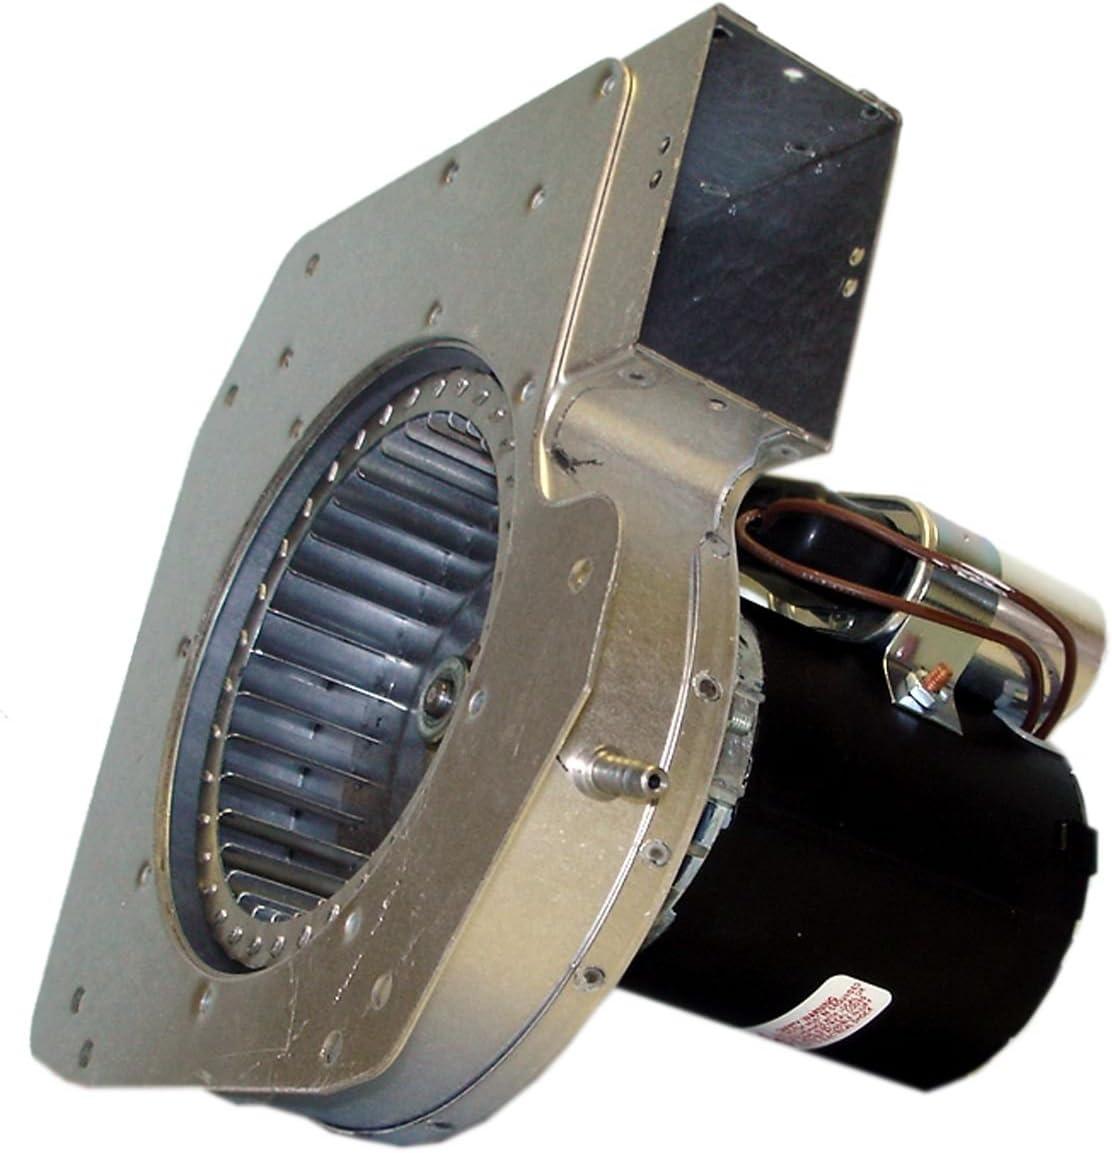 7062-4517 7062-4083 Lennox 7062-5546 Fasco A330 Specific Purpose Blowers 7062-4608 69M3301